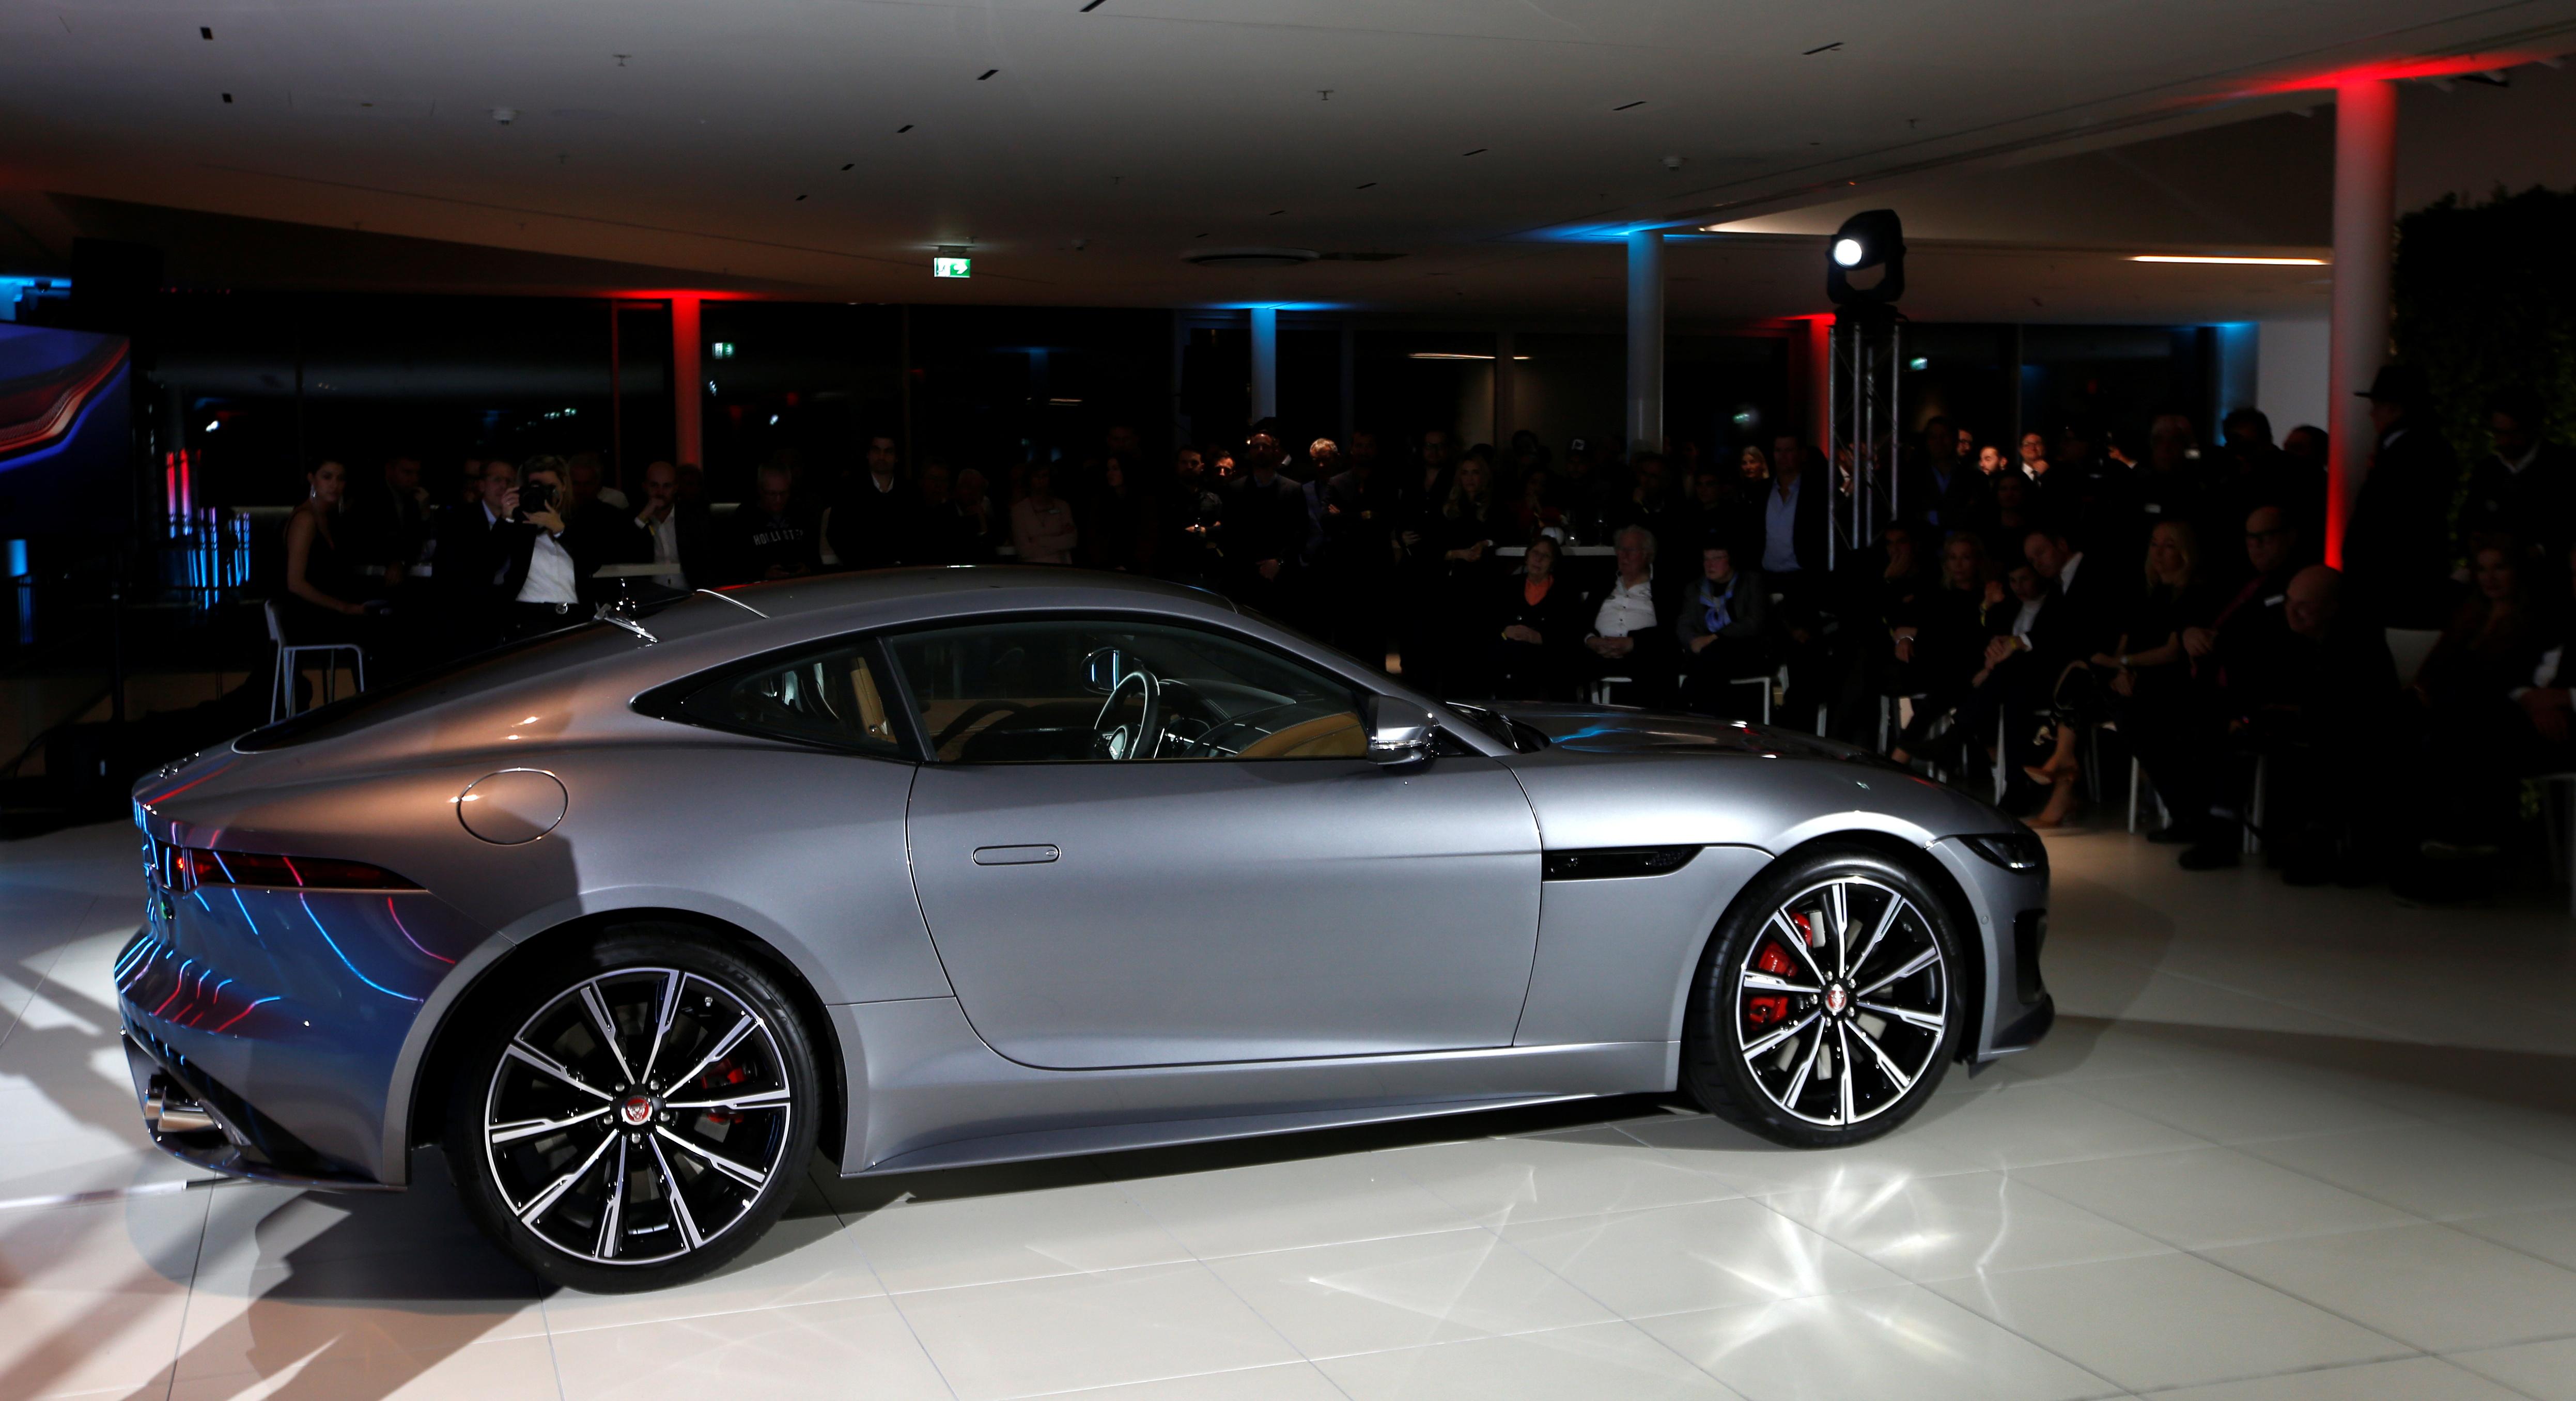 Jaguar Land Rover unveils the new Jaguar F-Type model during its world premiere in Munich, Germany, December 2, 2019. REUTERS/Michaela Rehle